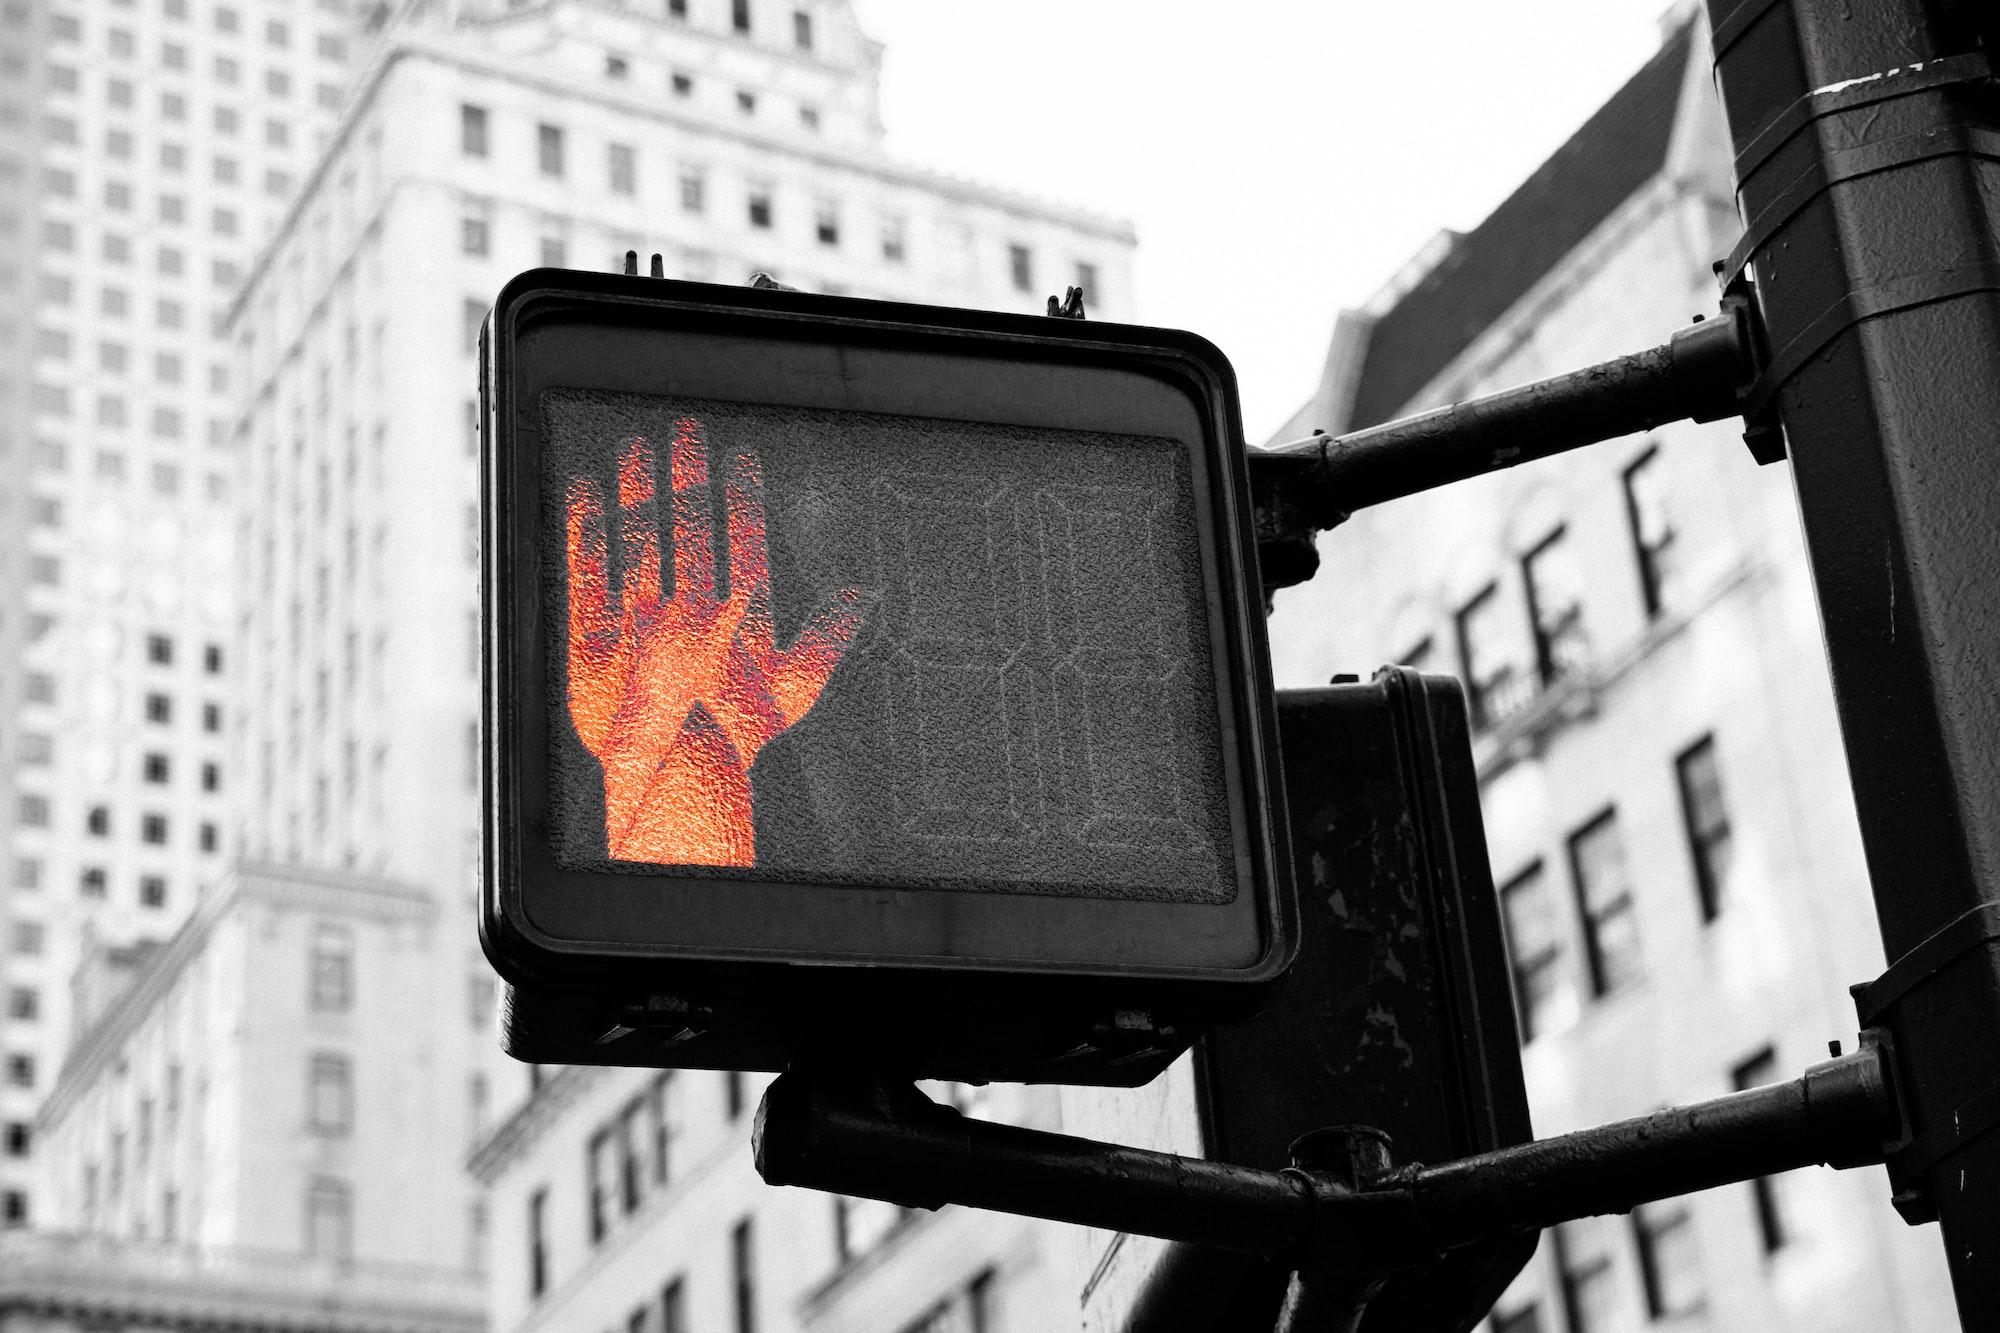 How to avoid BBC iPlayer Detecting VPN